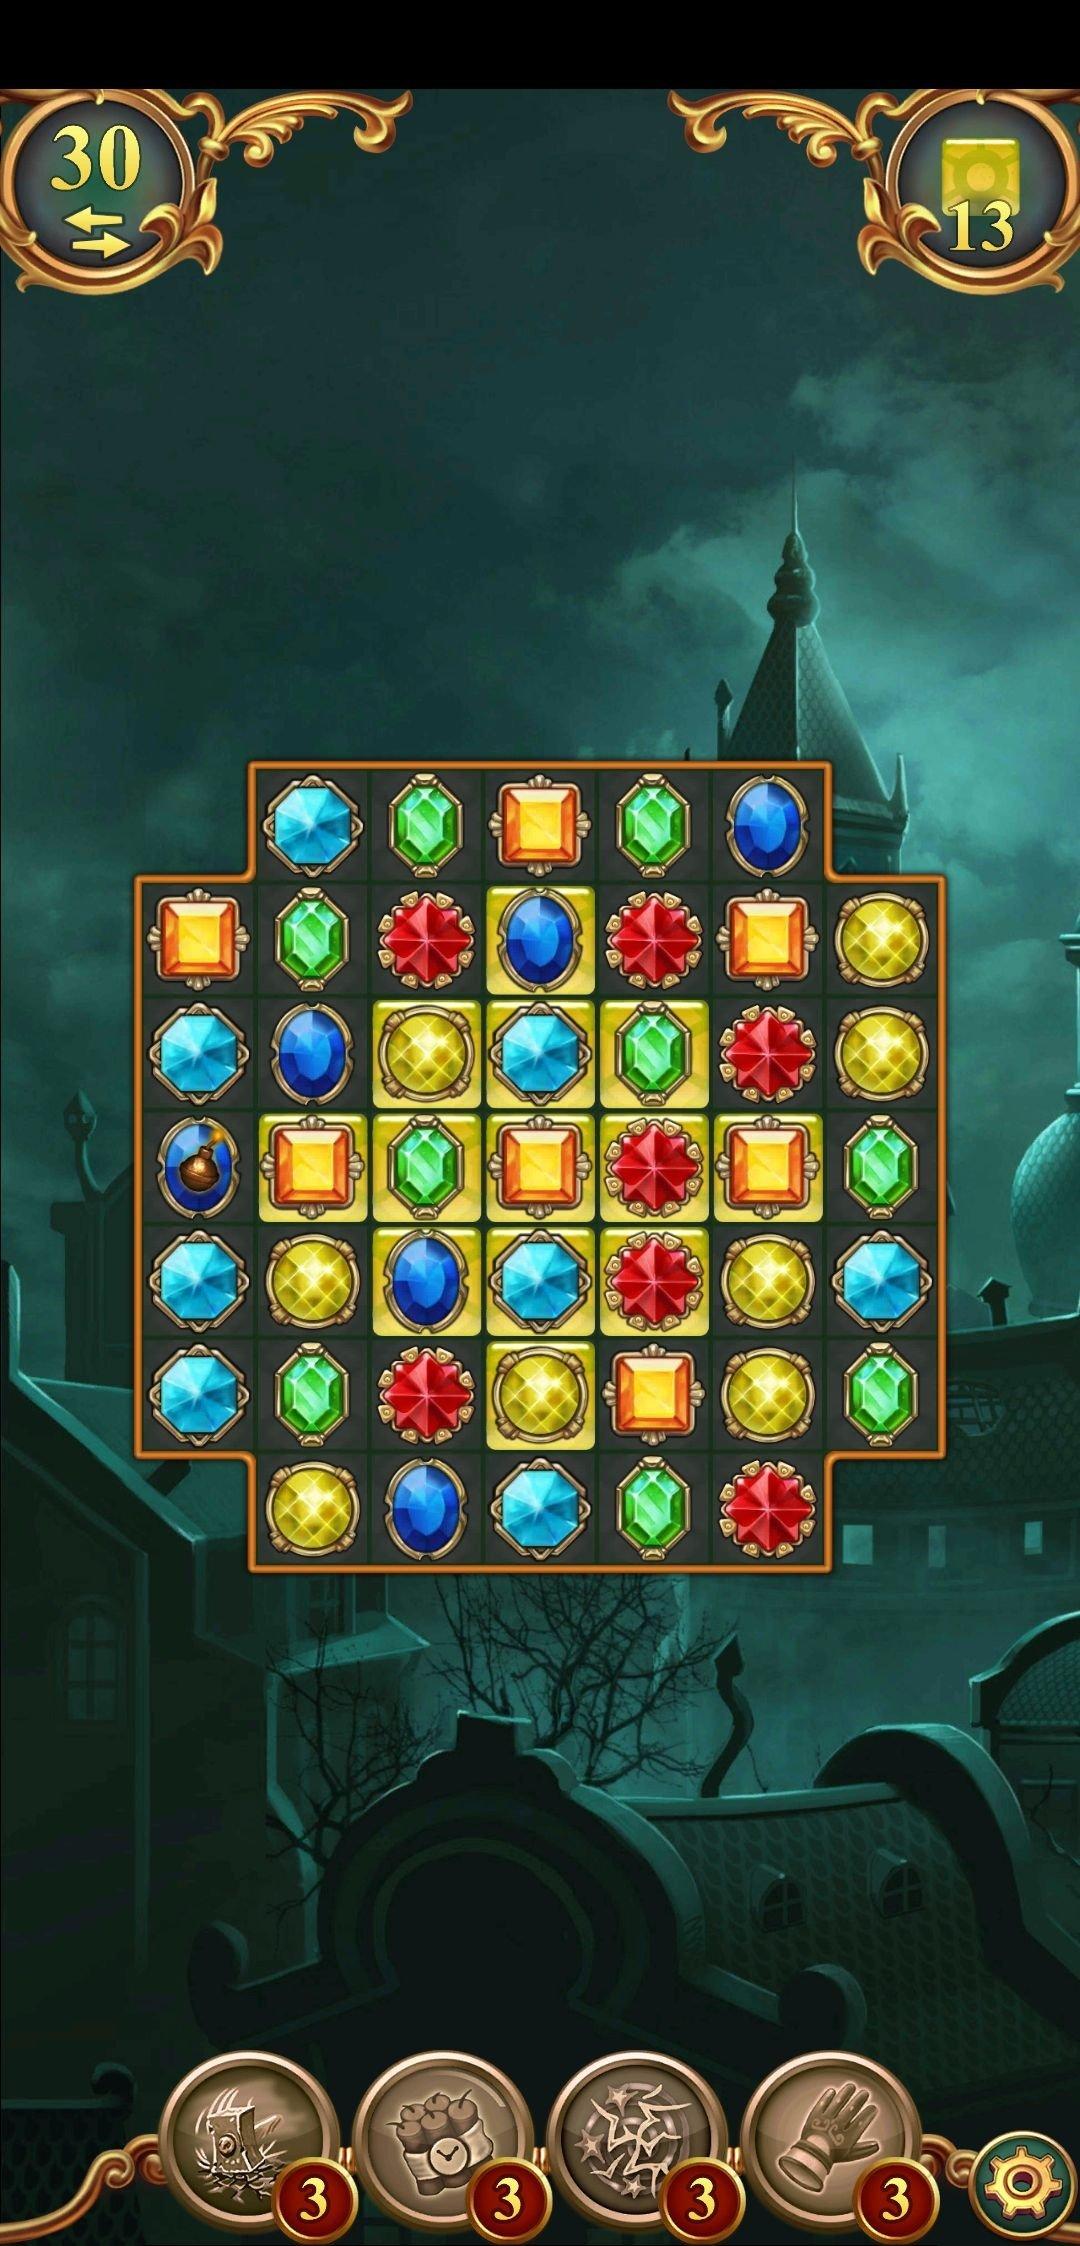 Clockmaker game online, free